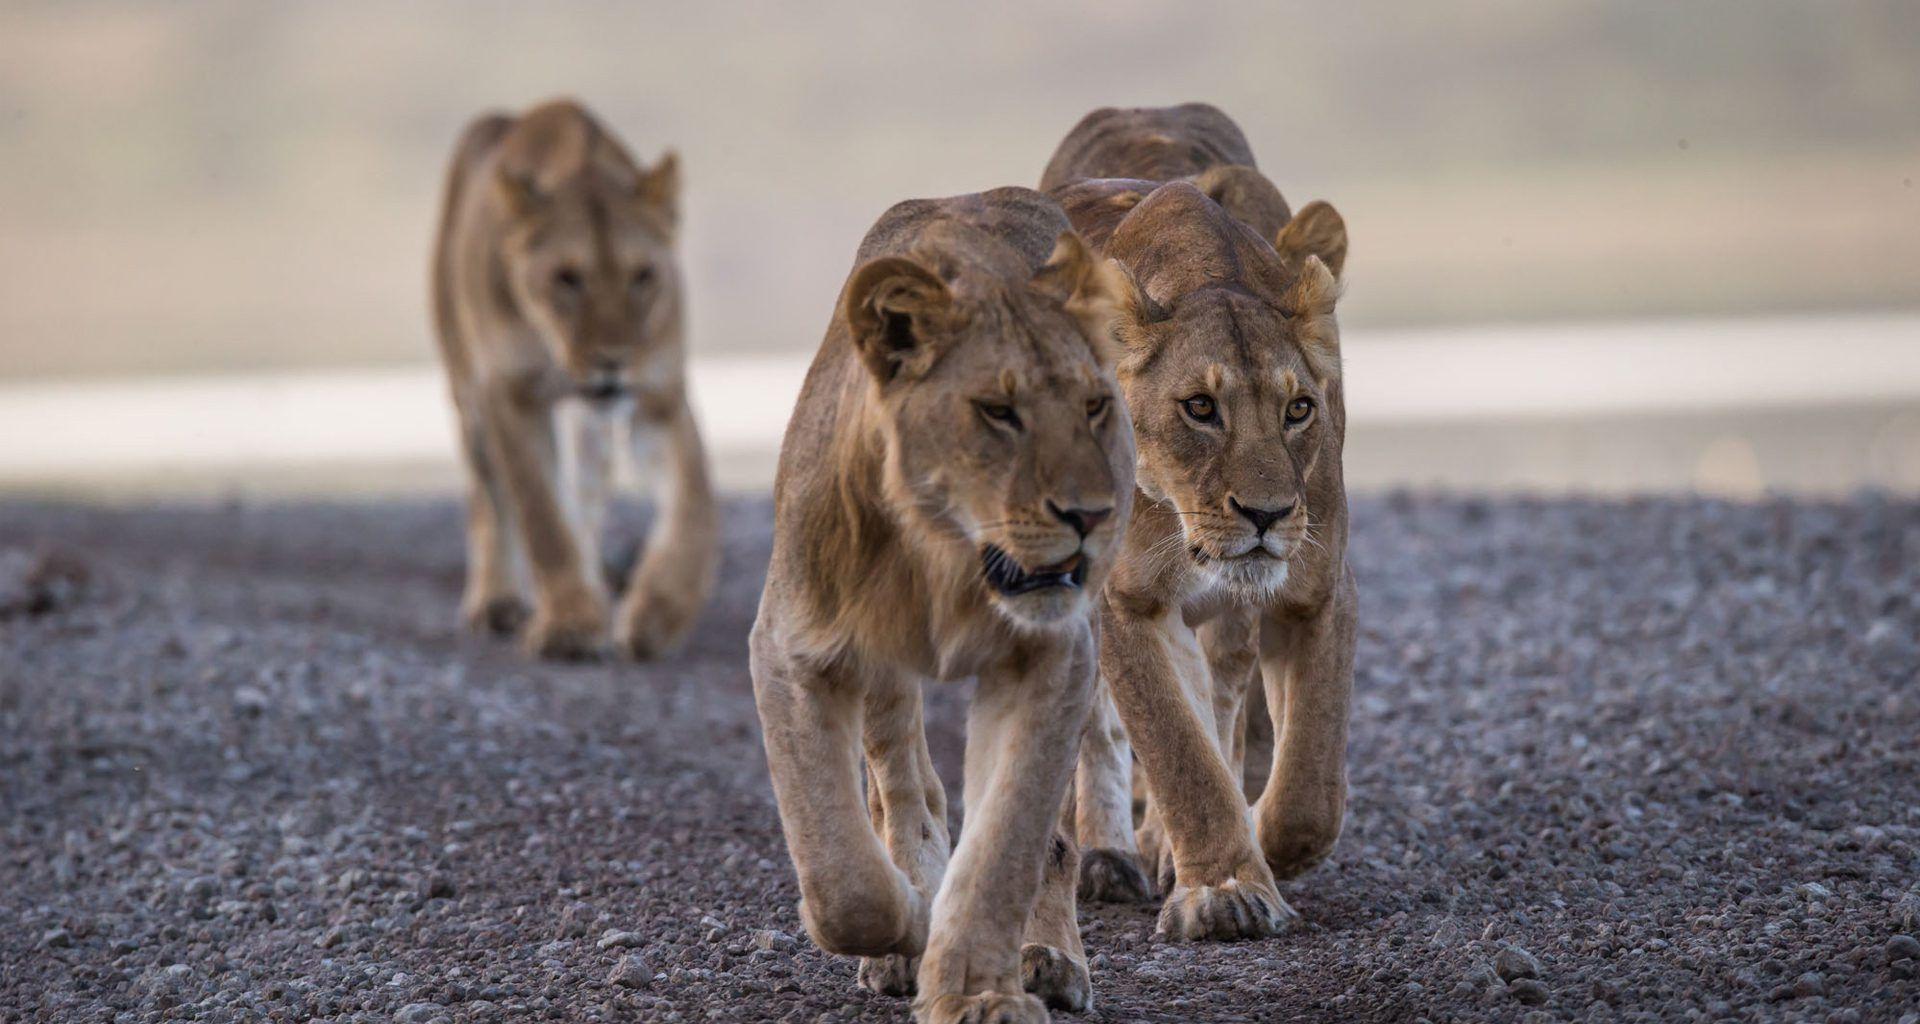 Tanzania-Loliondo-Serengeti-Lion